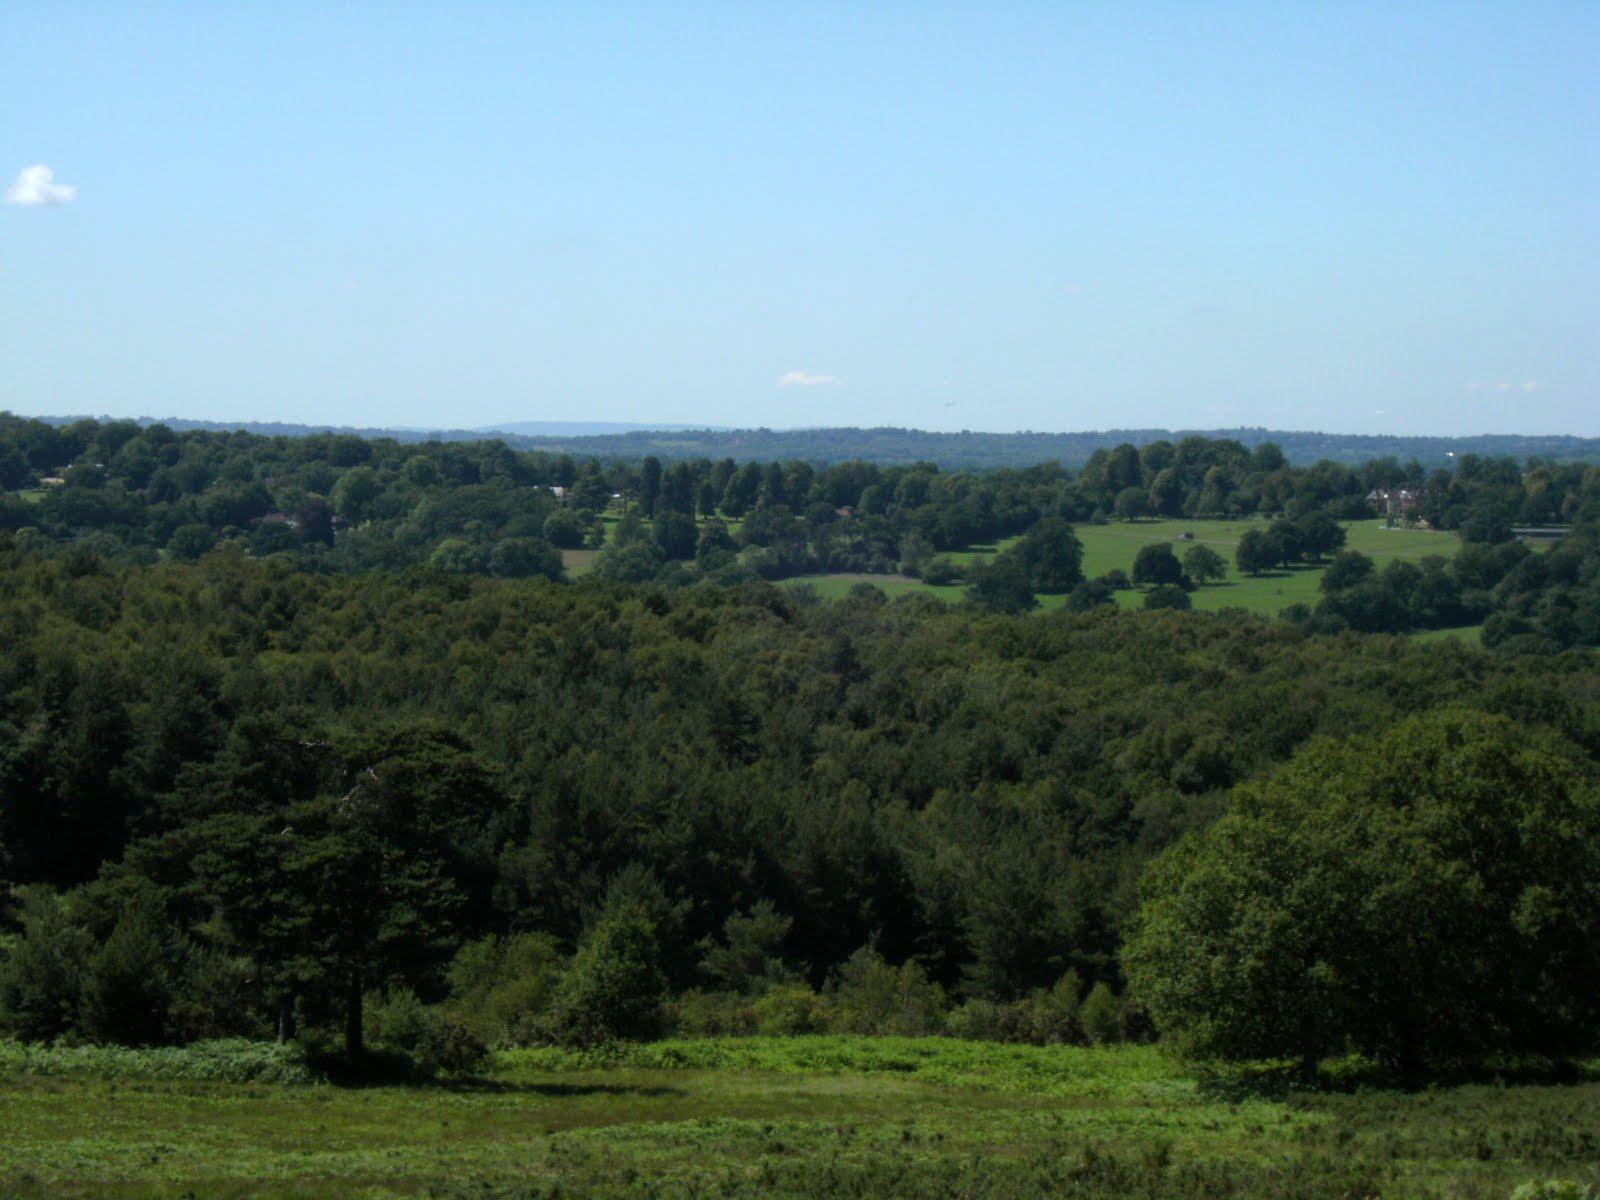 DSCF8738 Summer view from Ashdown Forest